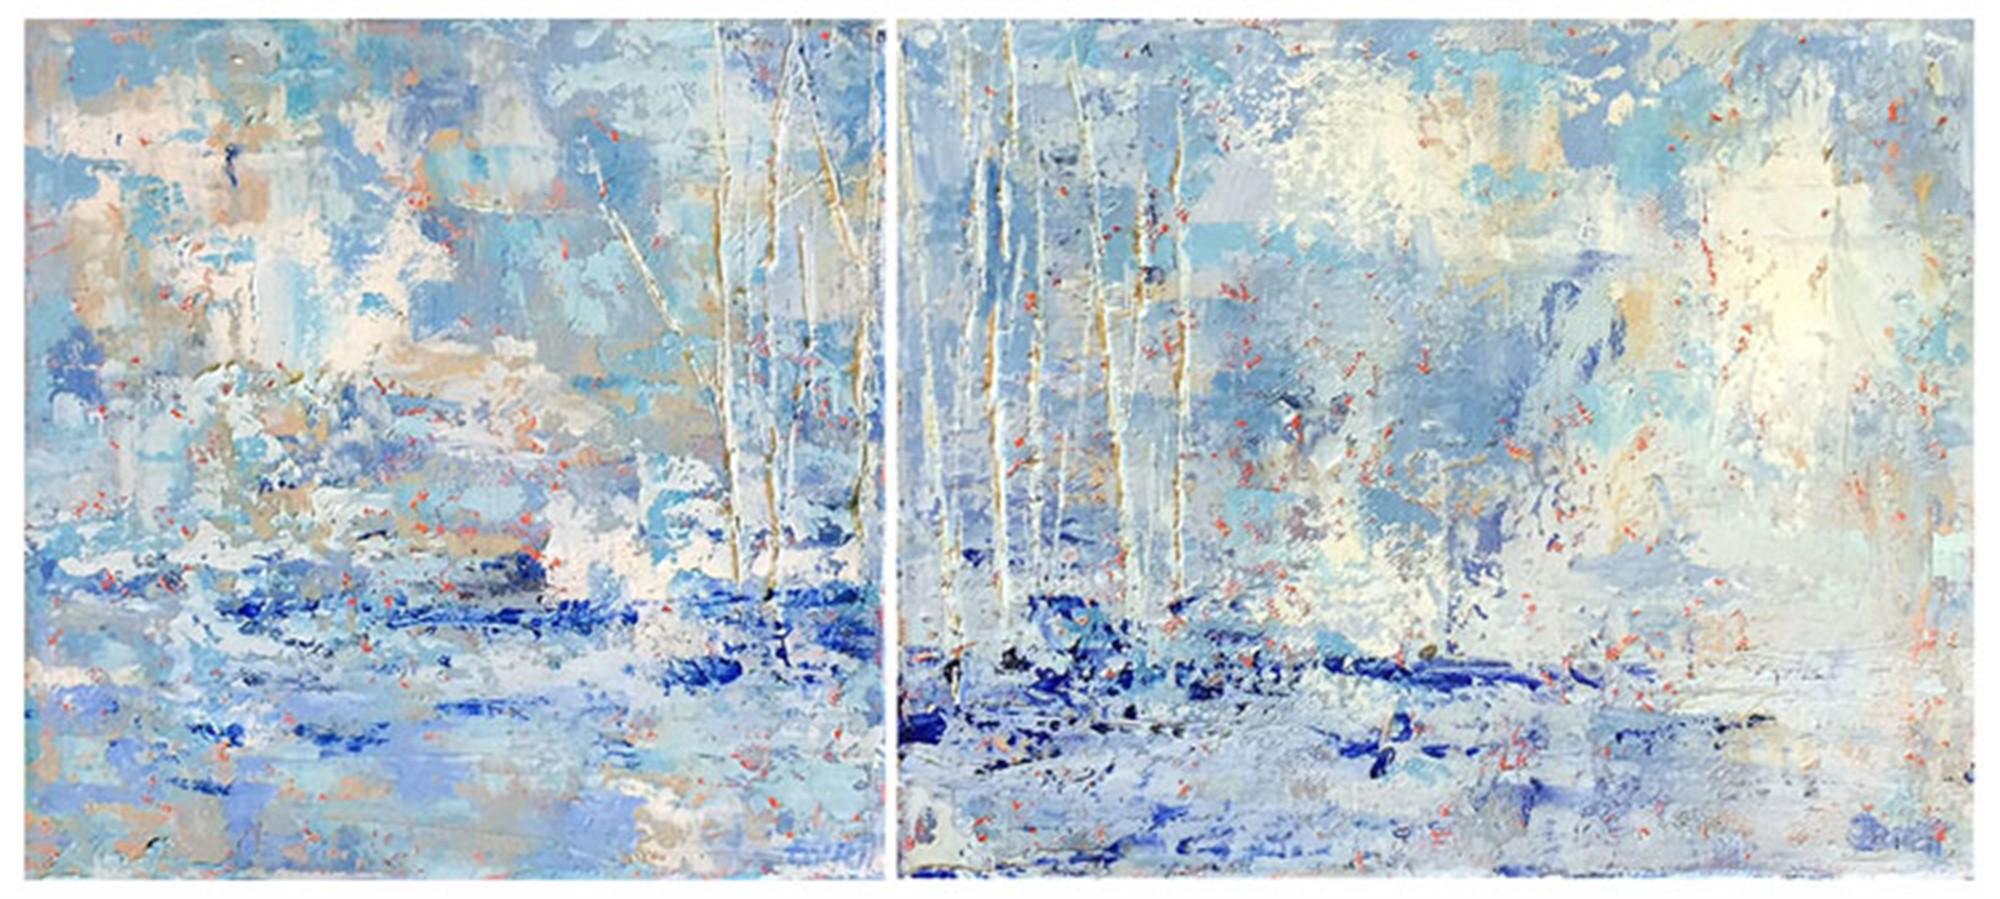 Solstice I & II (diptych) by Barrett Edwards